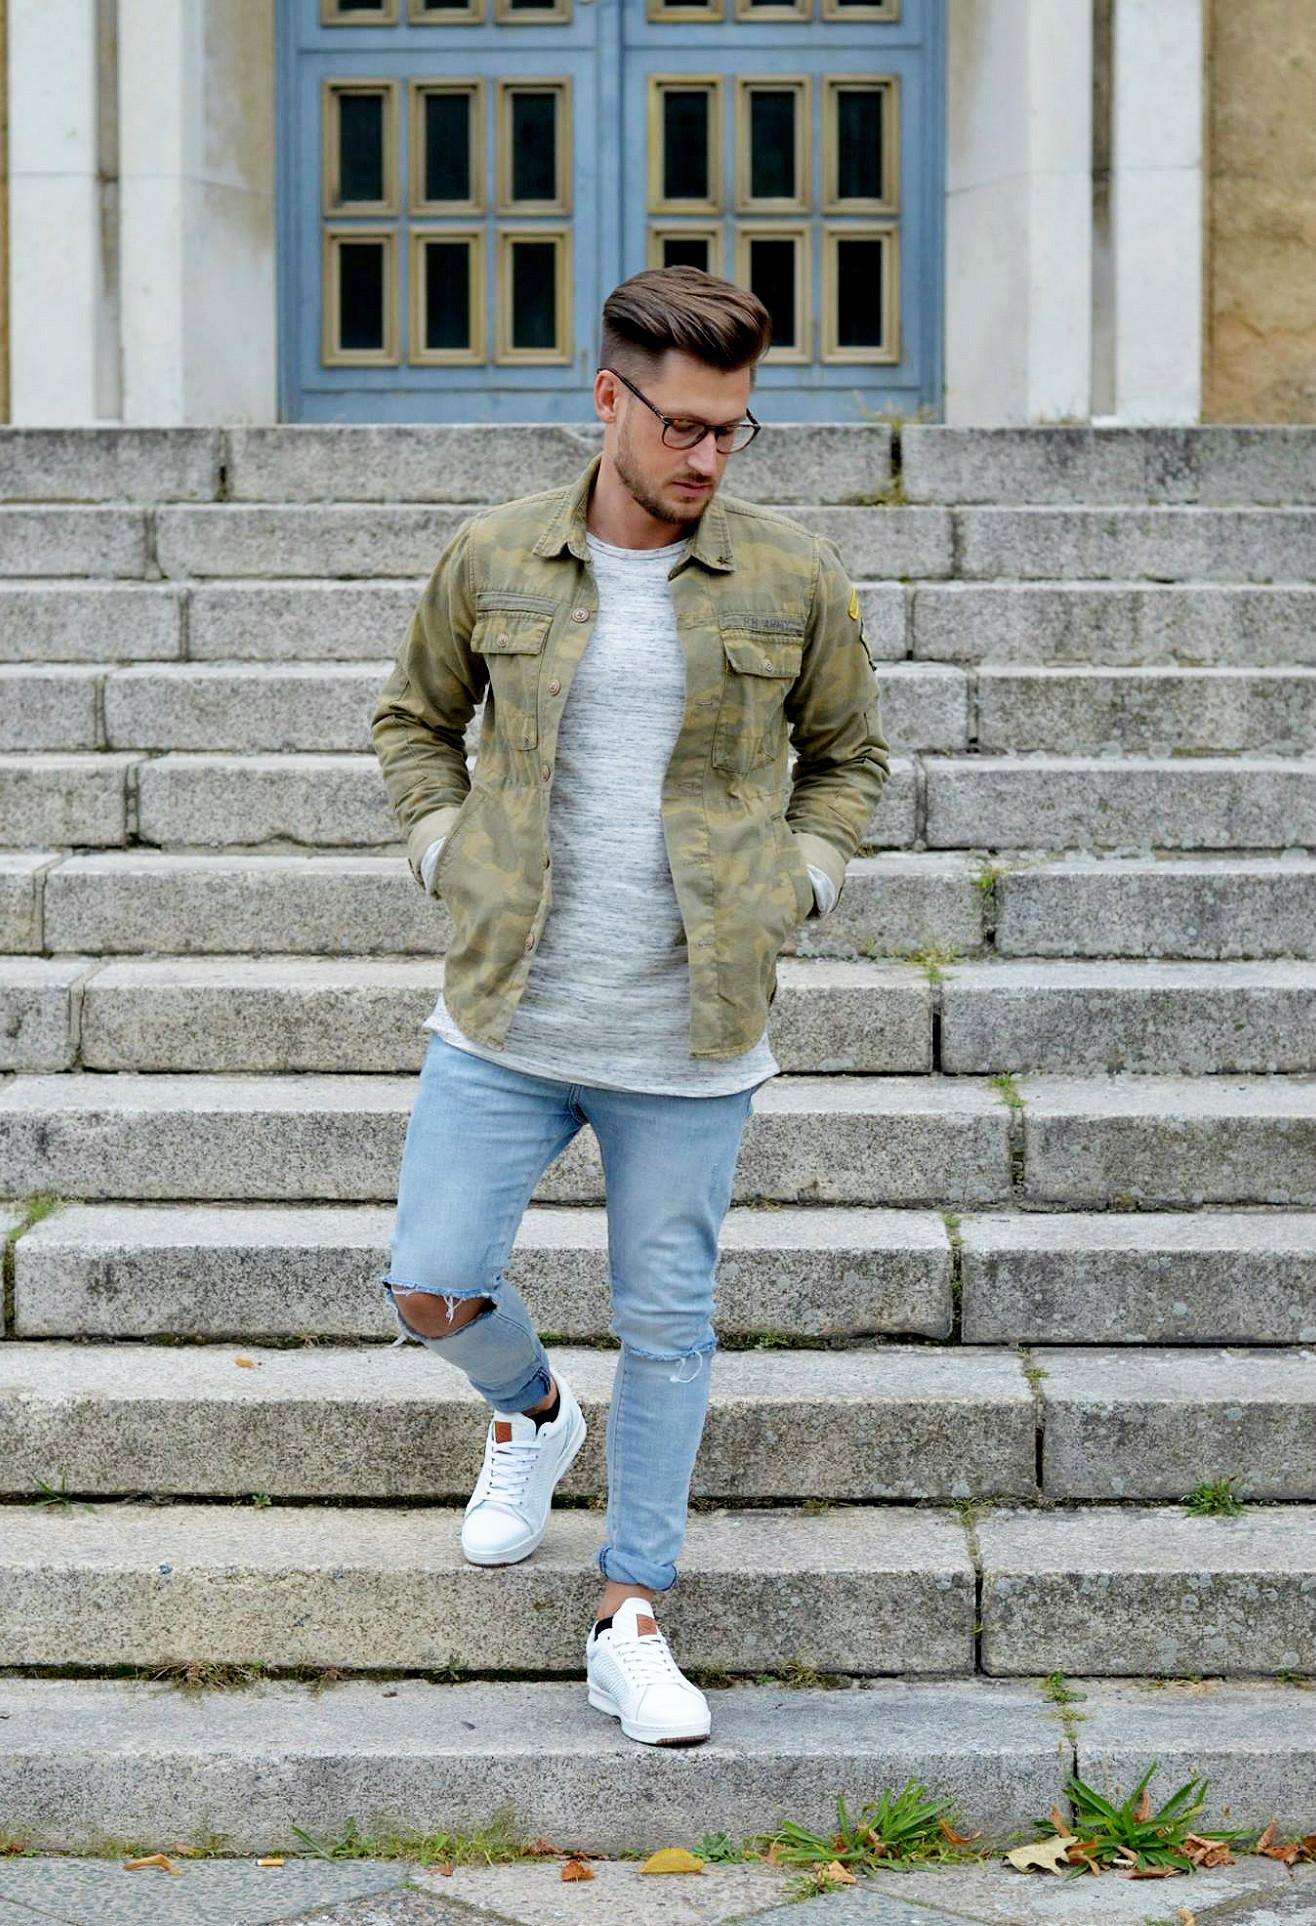 Modeblog-Berlin-Männer-Blog-Fashion-Camouflage-Jacke-Skinny-Jeans-Sneaker-grey-Sweatshirt